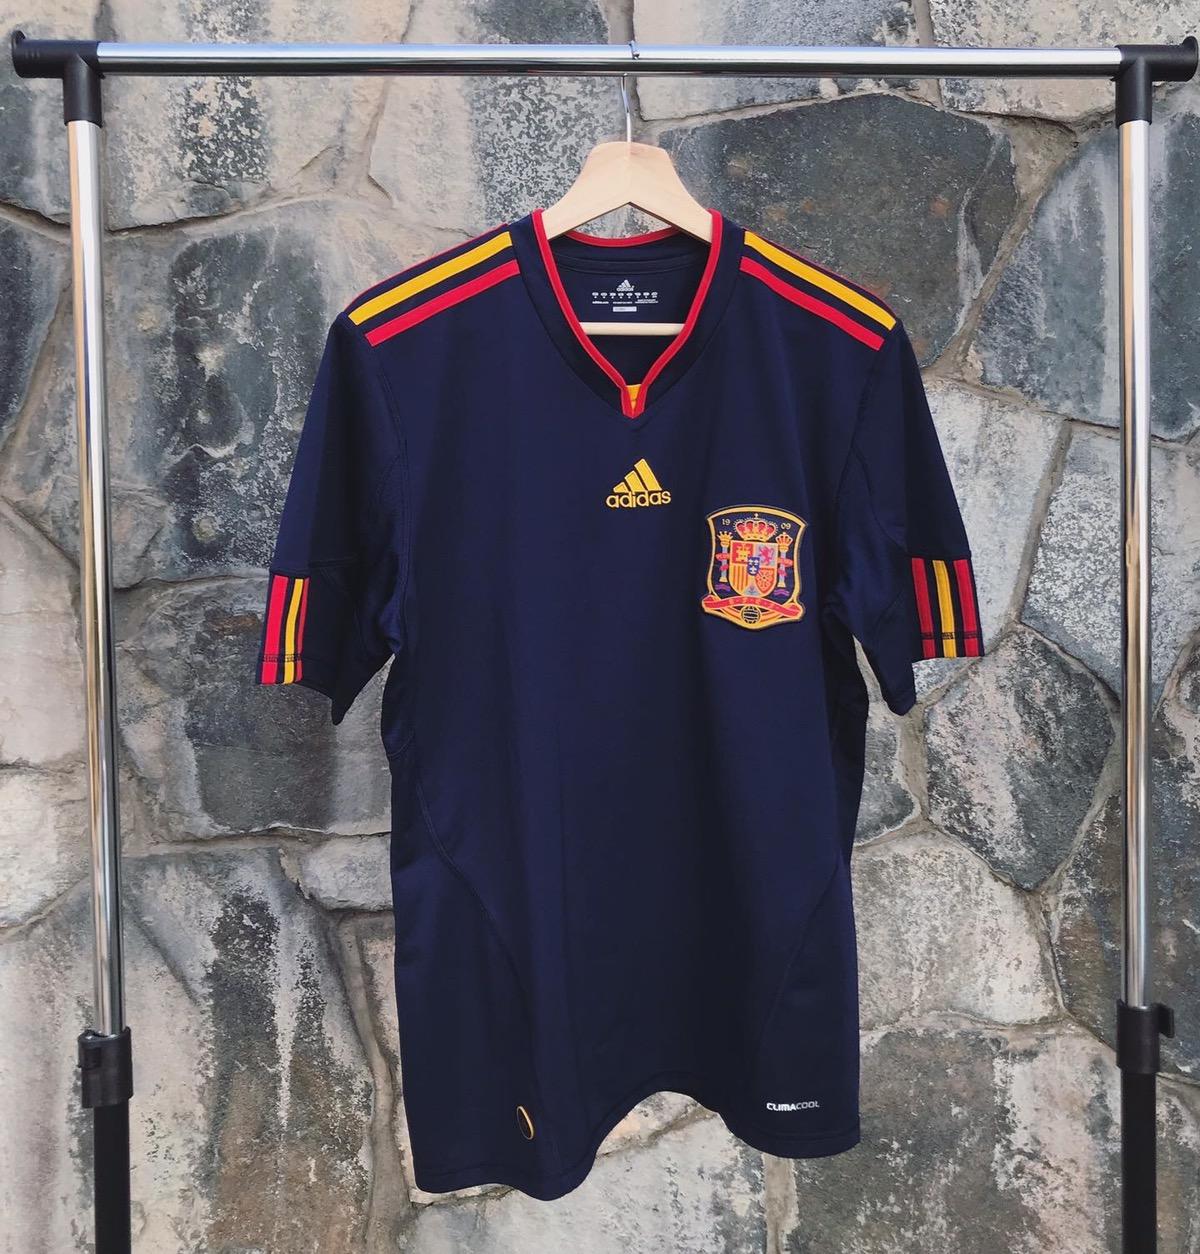 Adidas 2010 Spain World Champions Away Jersey